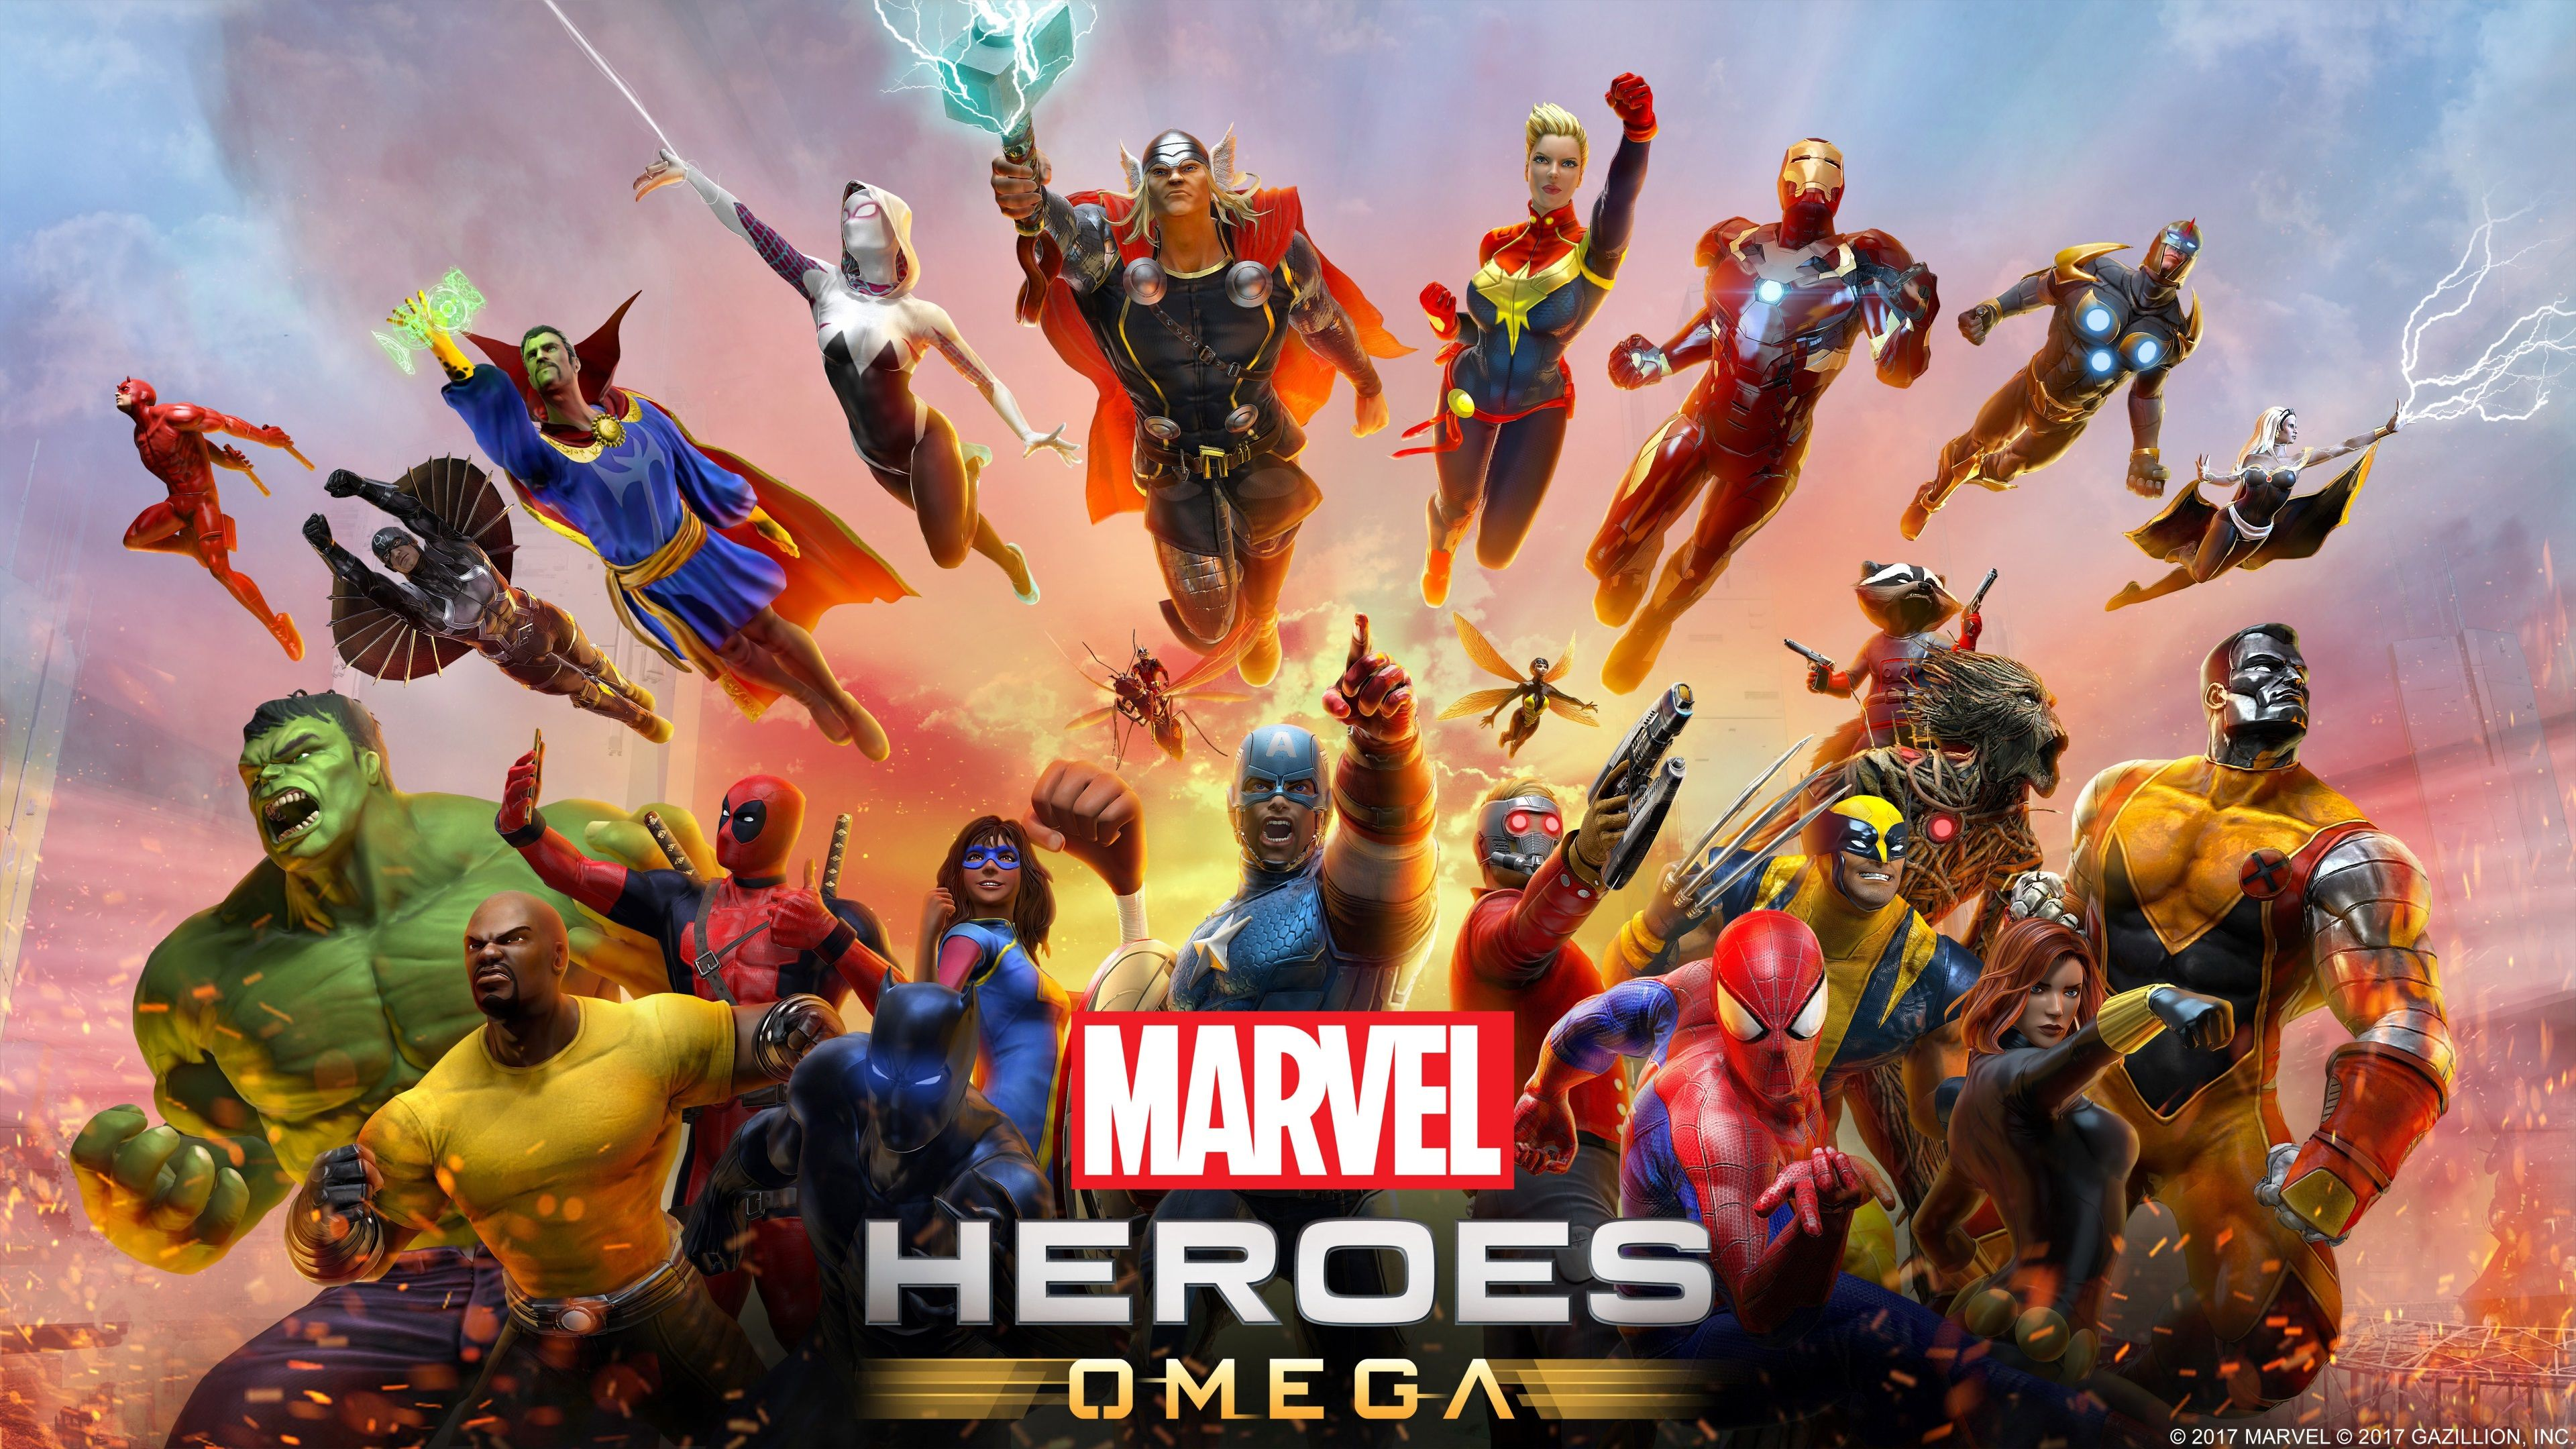 3840x2160 marvel heroes omega 4k wallpaper hd puter desktop